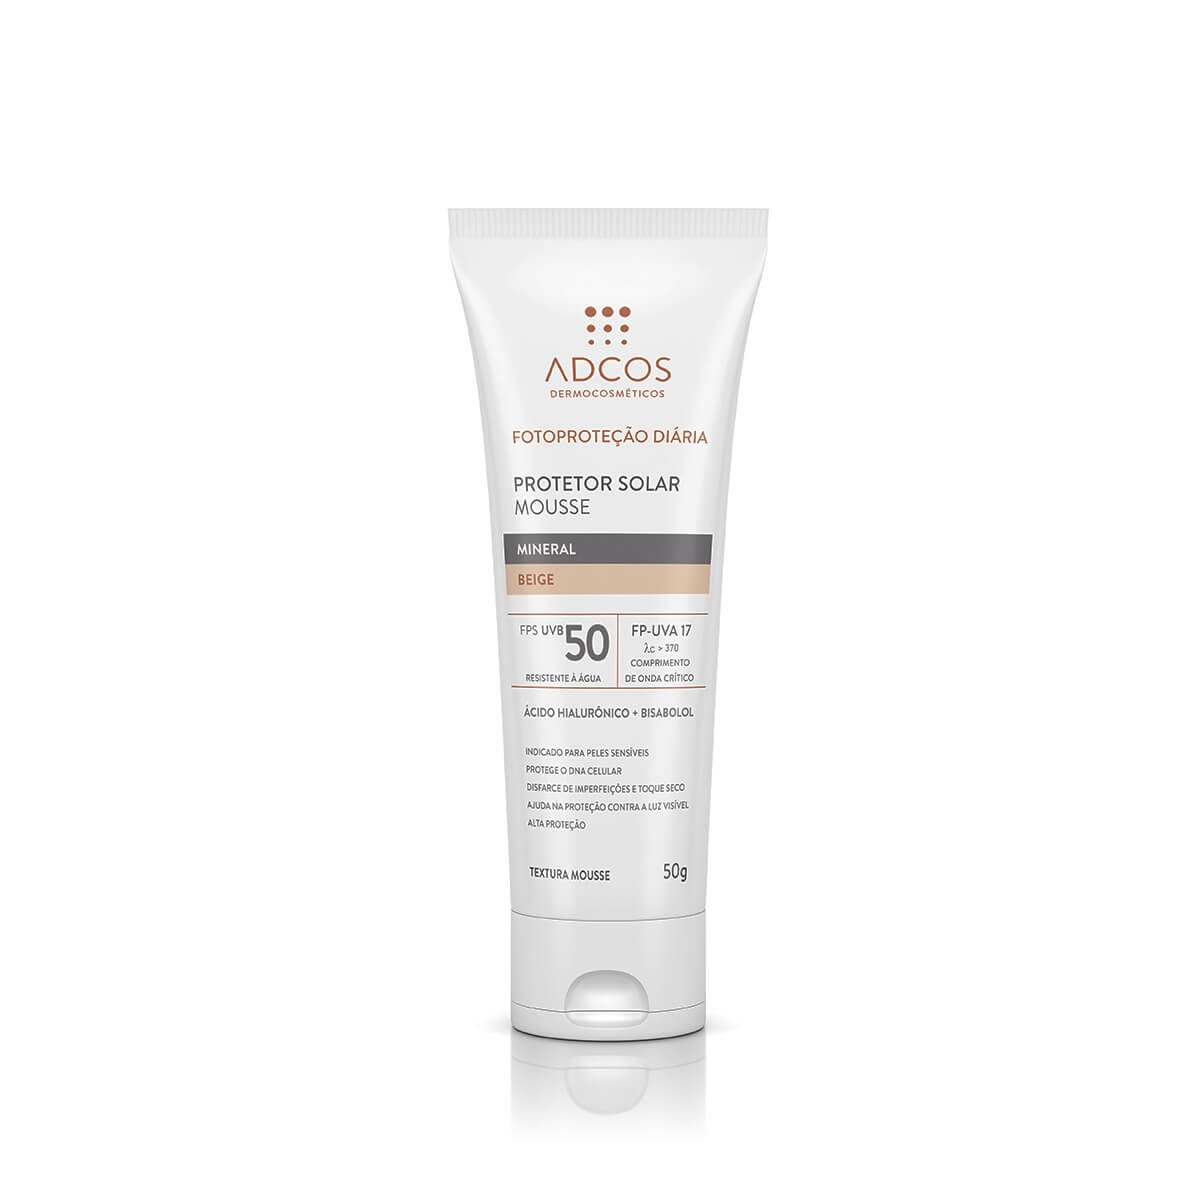 Protetor Solar Mousse Adcos Mineral Beige FPS50 50g